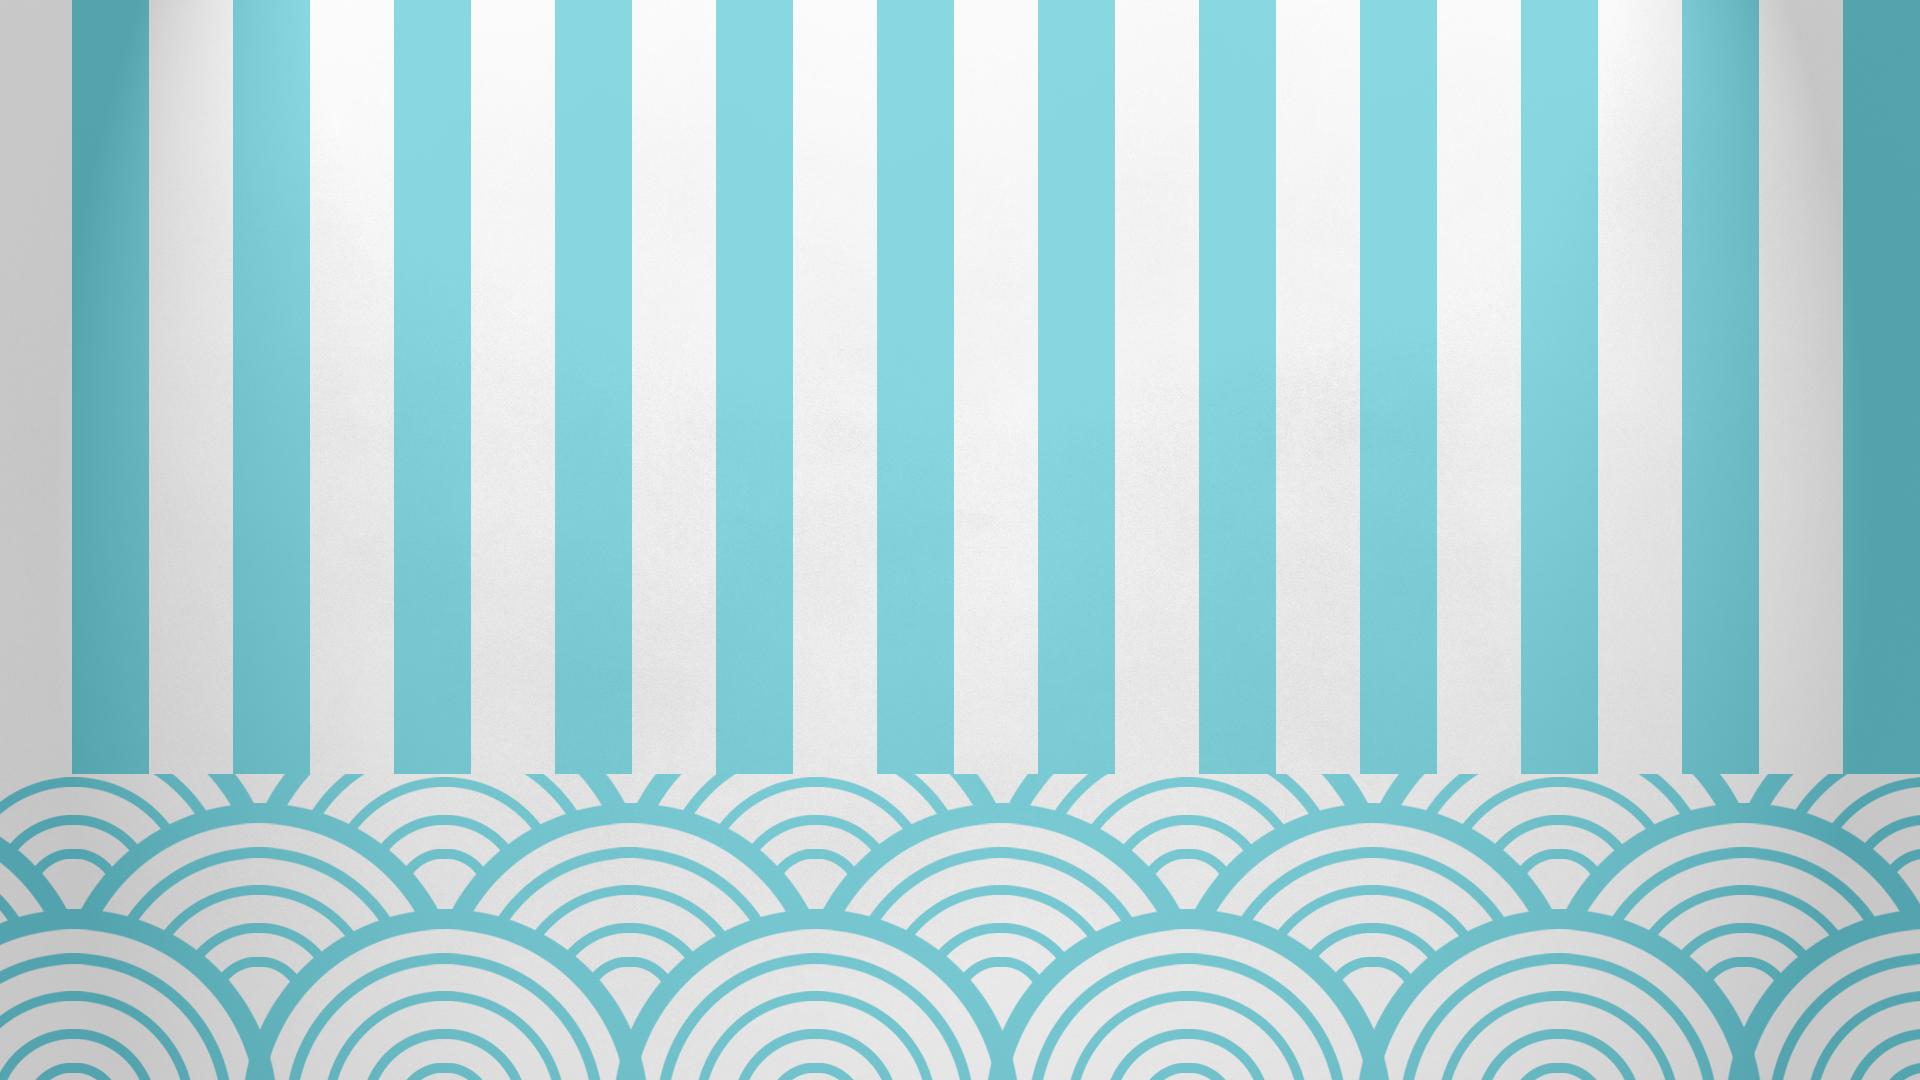 Cute Stripe Pattern Background Tumblr<br> | Patterns | Pinterest